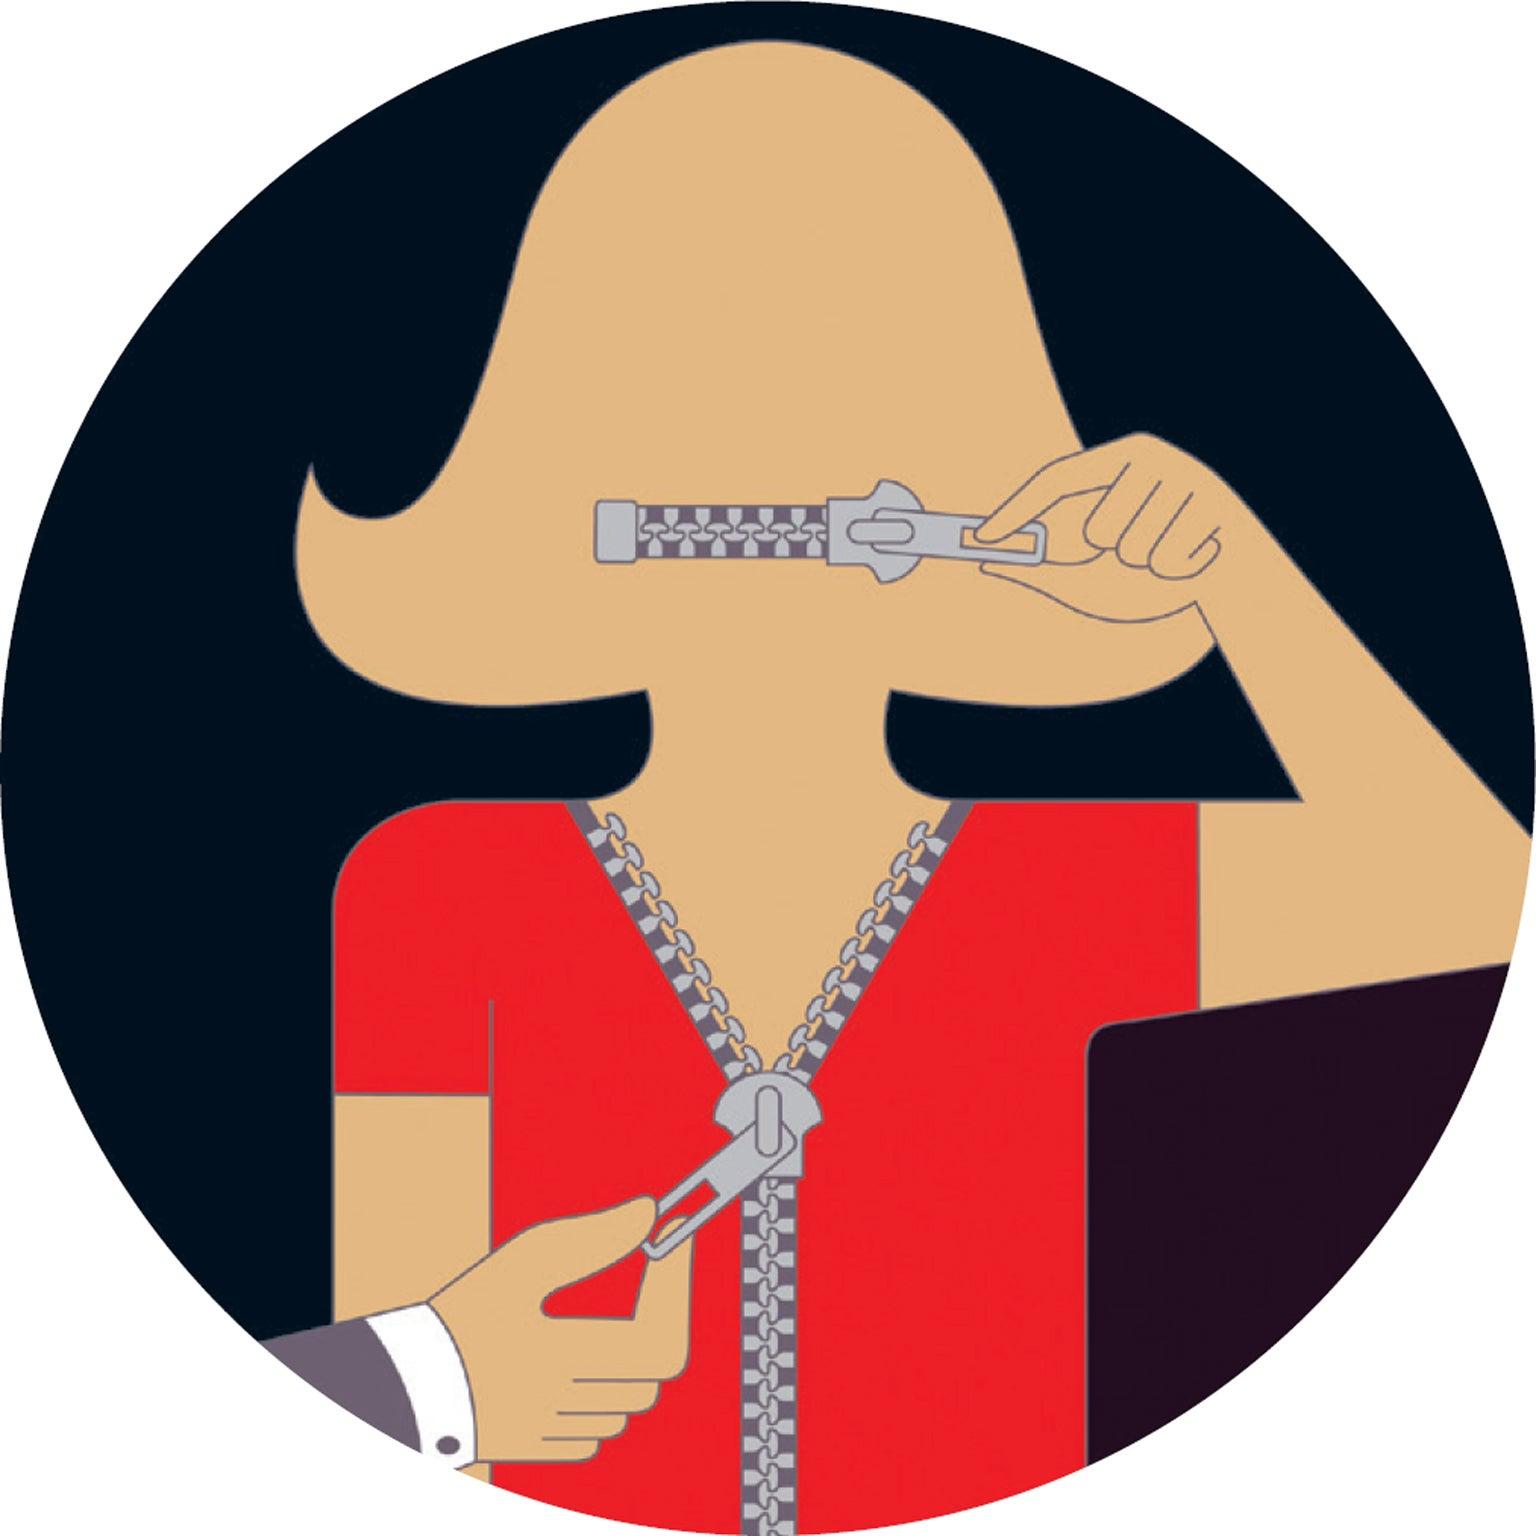 Women Still Face Retaliation for Reporting Sexual Harassment